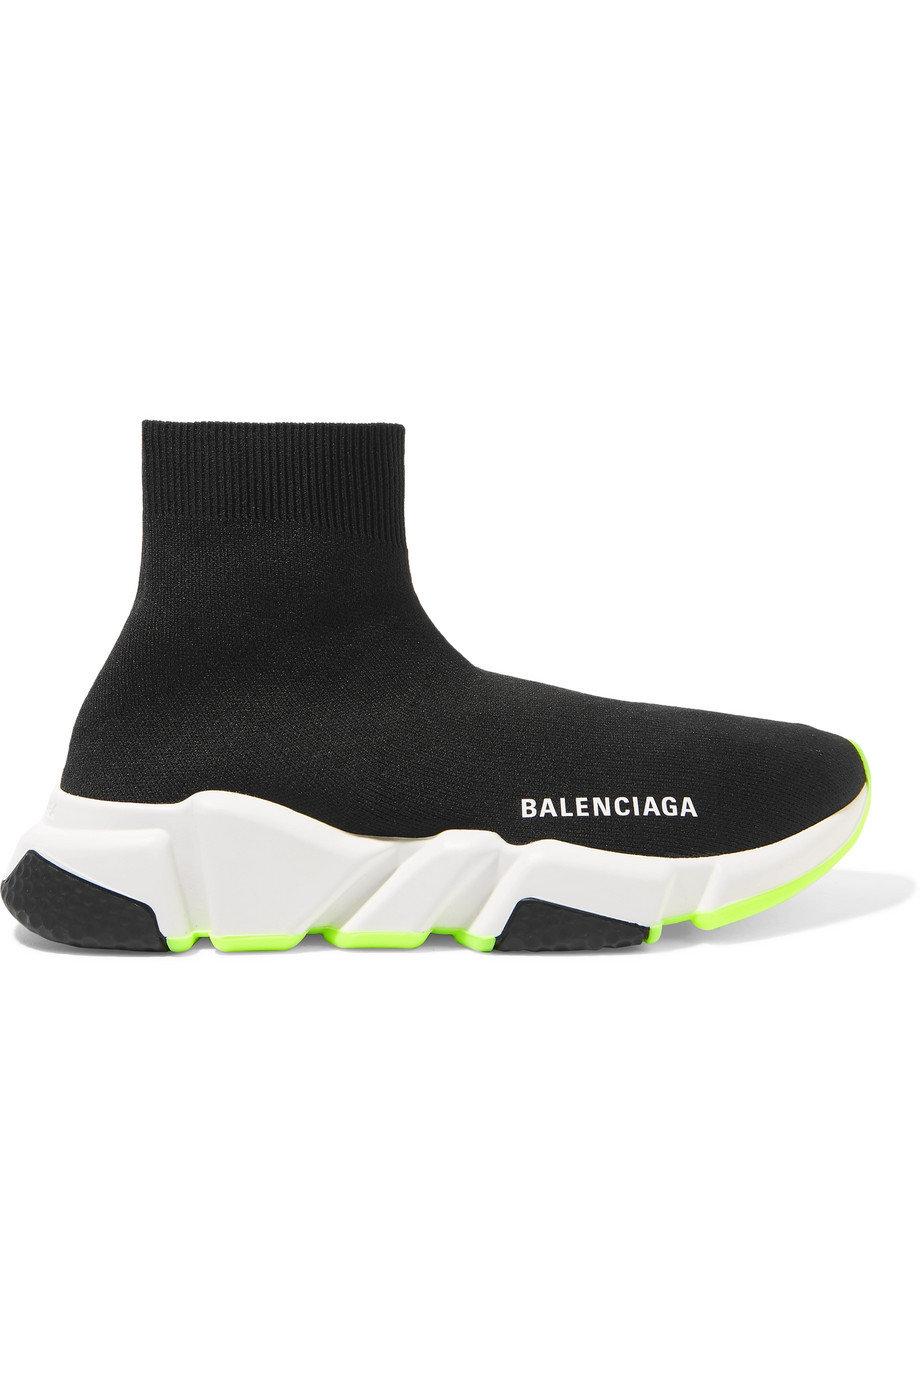 cheap for sale 100% high quality sale retailer Balenciaga Speed Trainer green sole